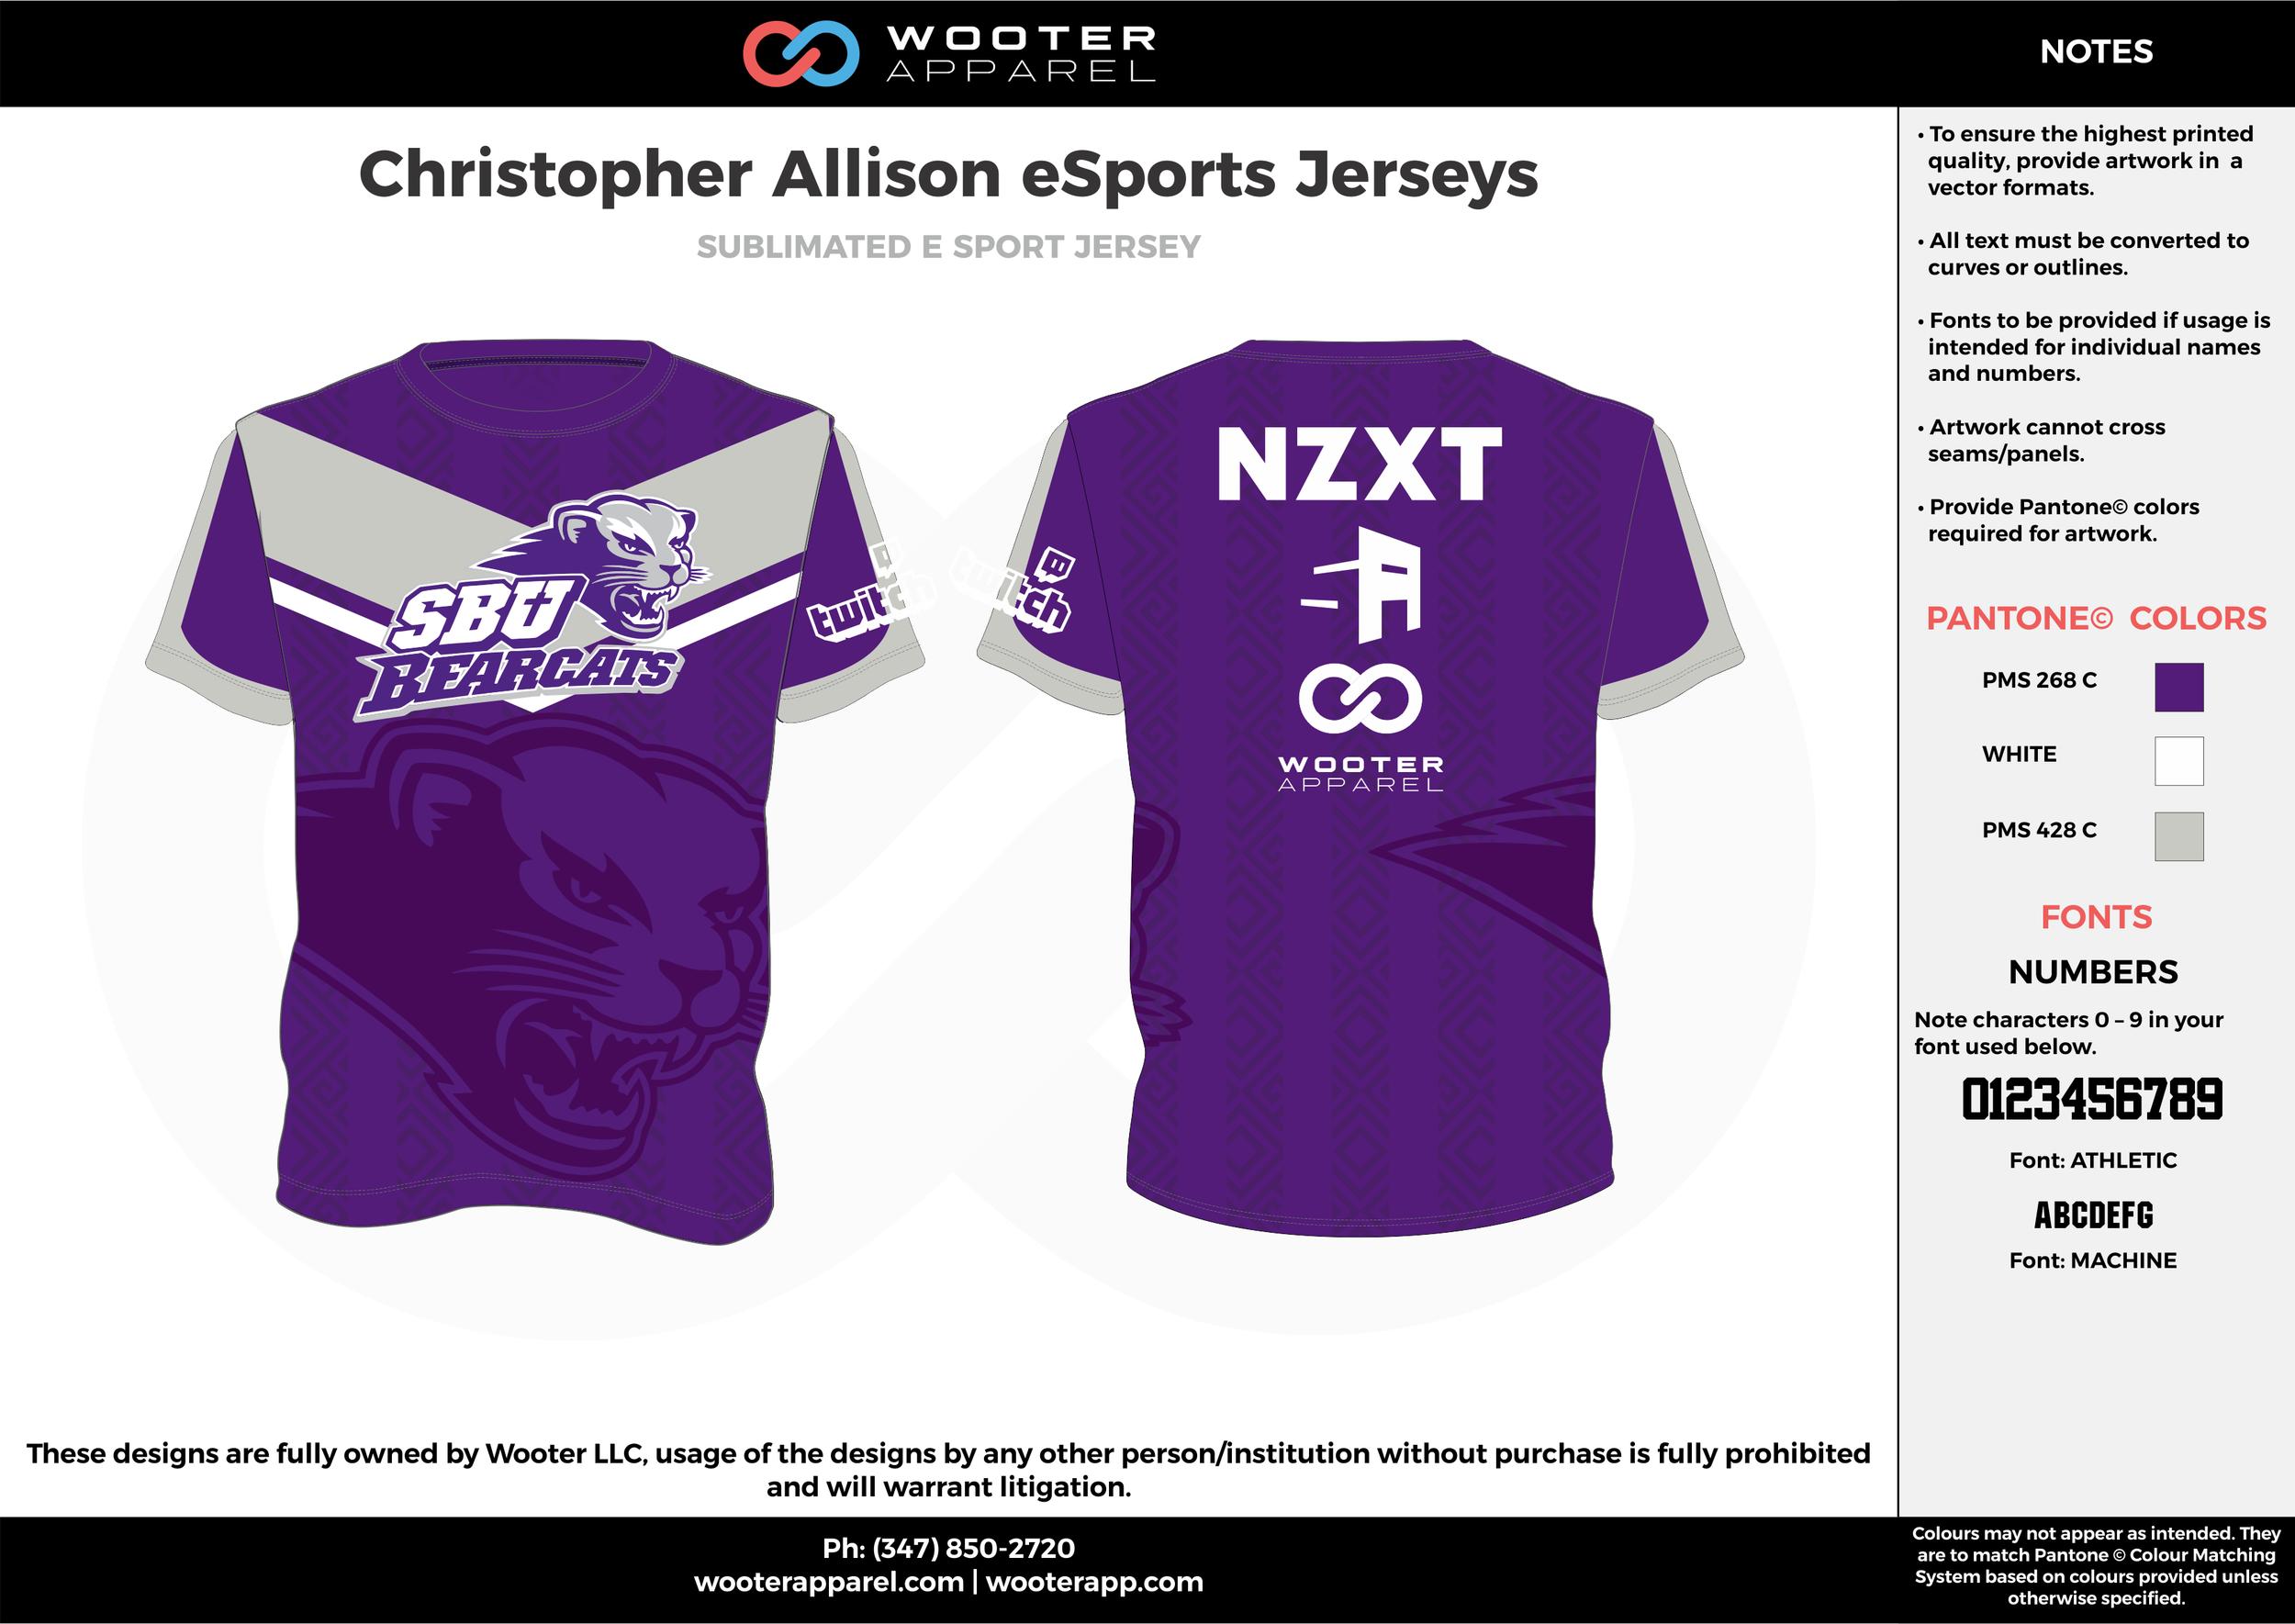 Christopher Allison eSports Jerseys purple white gray e-sports jerseys, shirts, uniforms